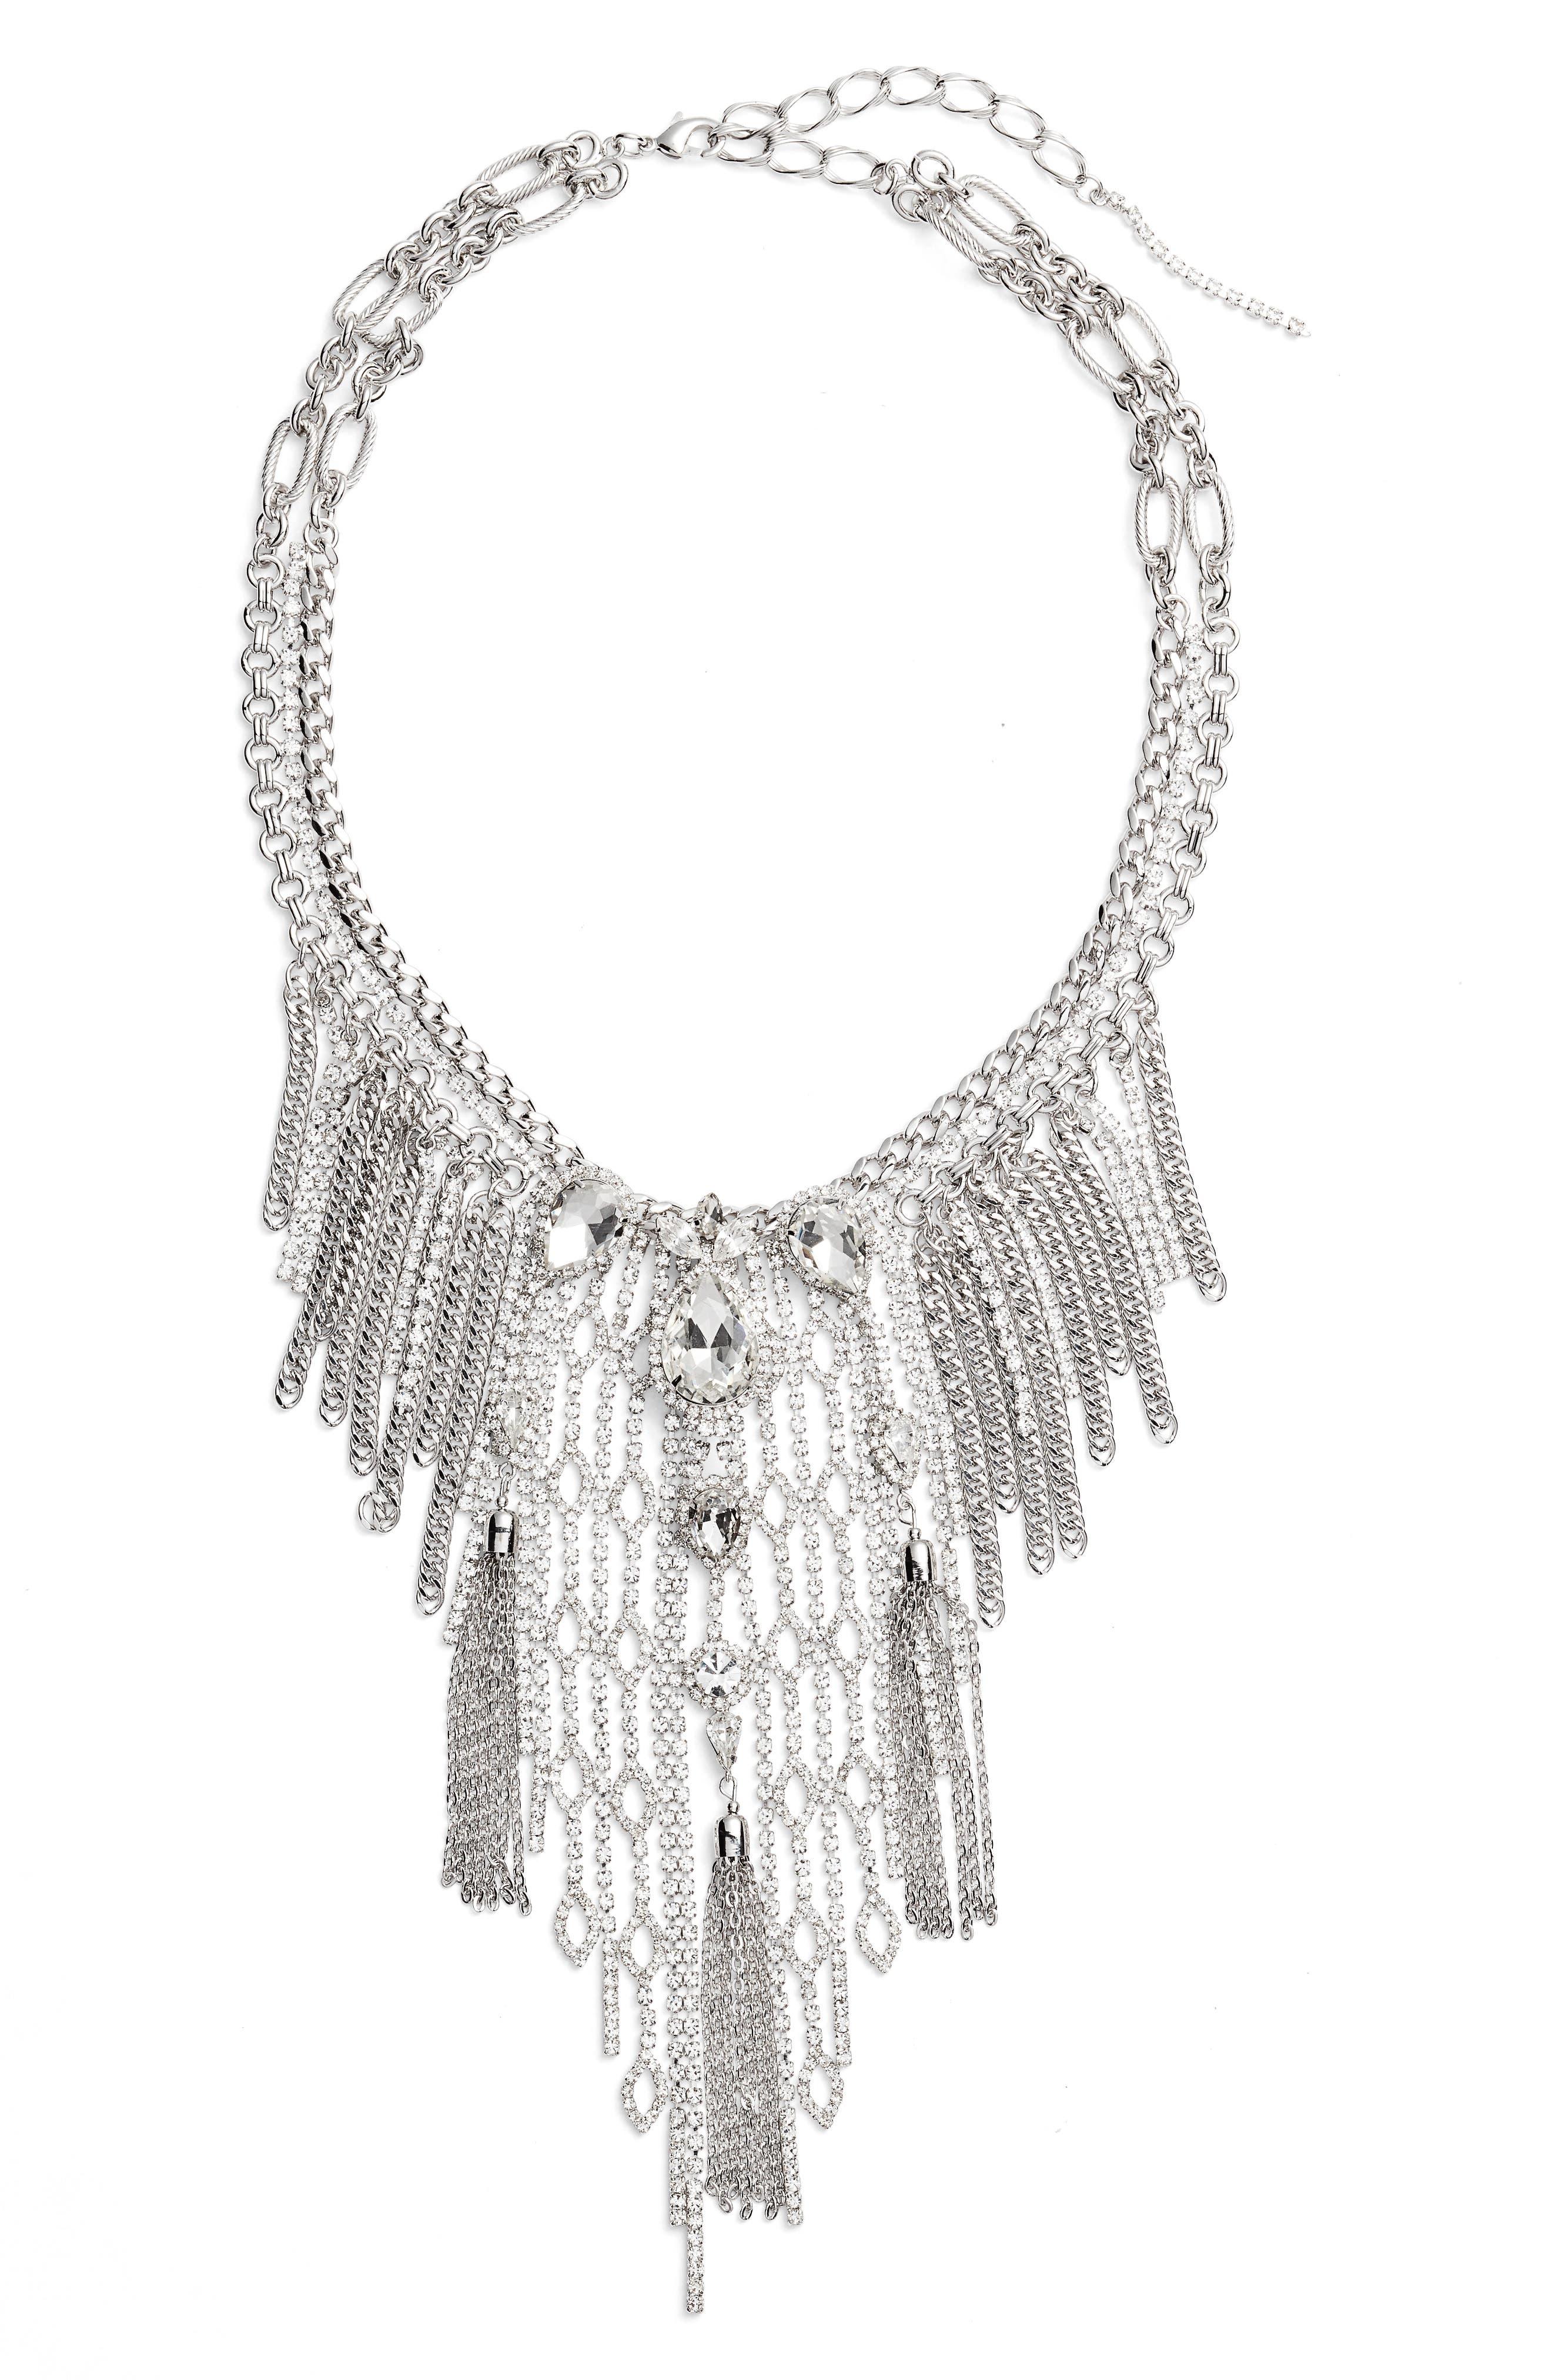 Cristabelle Chain Fringe Necklace